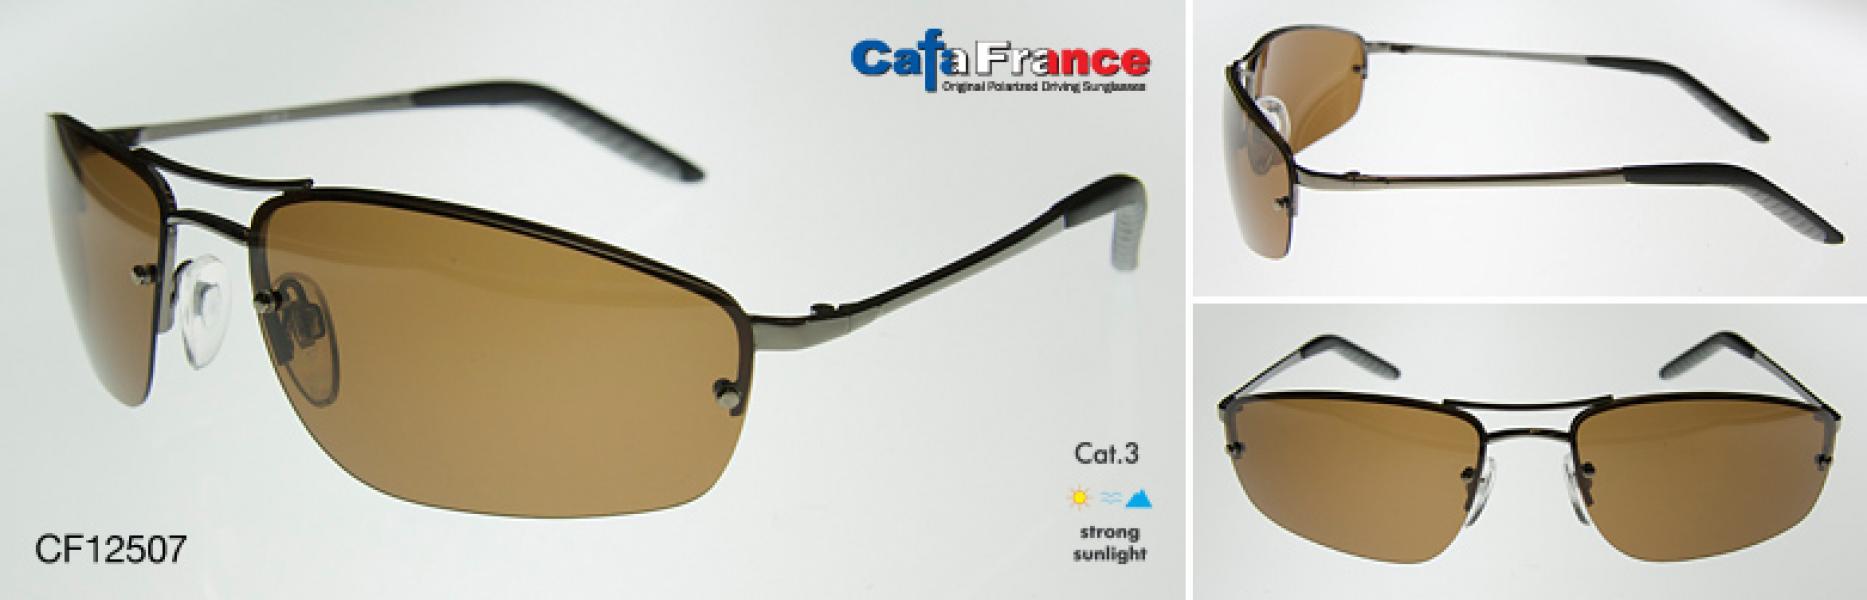 ���� ��������������� ������� Cafa France cf12507